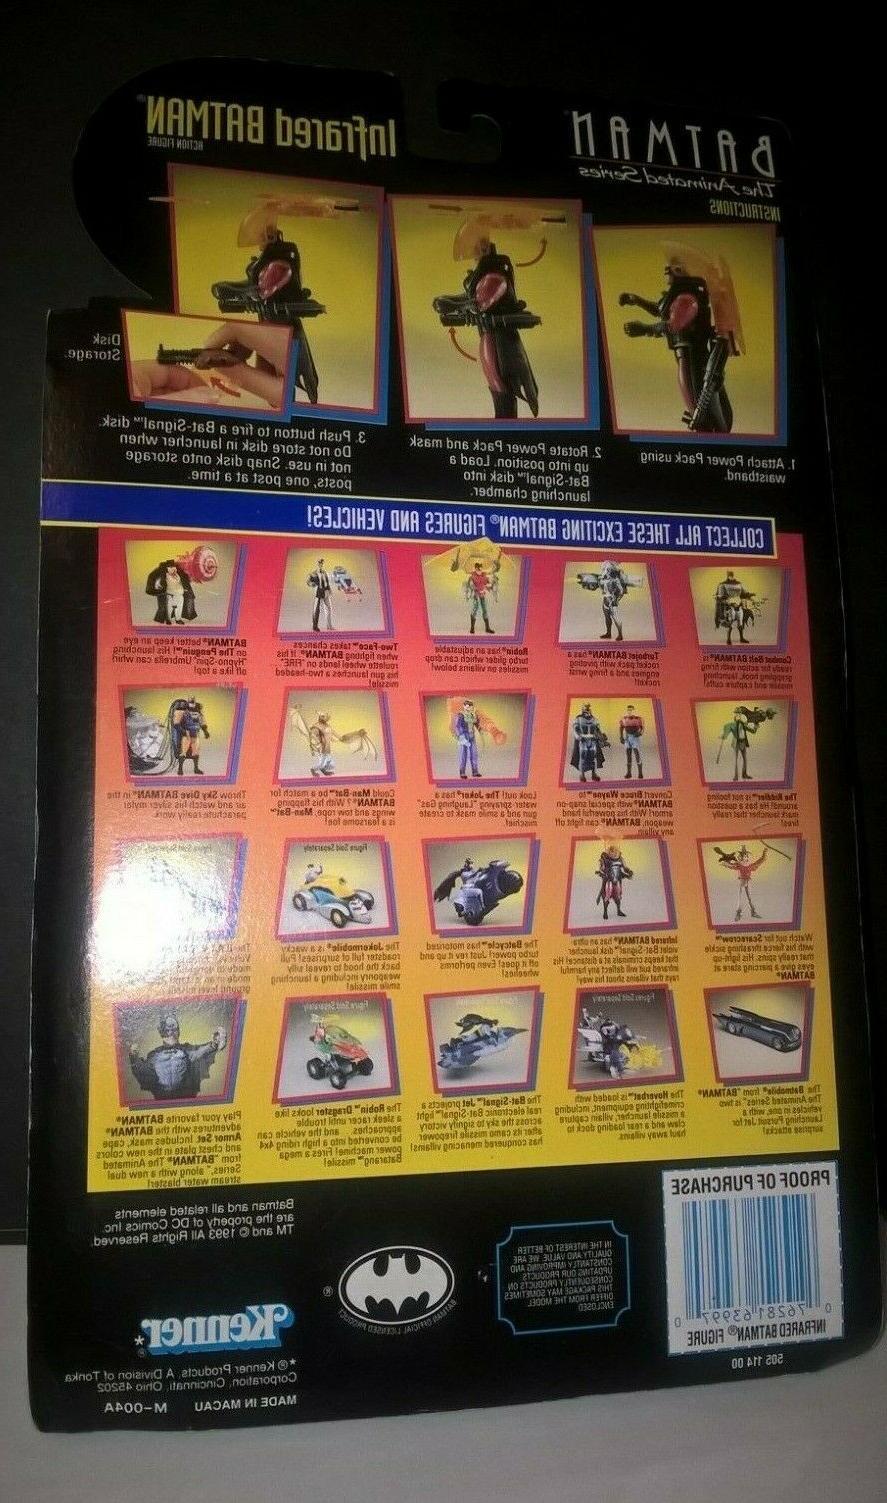 Infrared Series 1992 Animated Batman